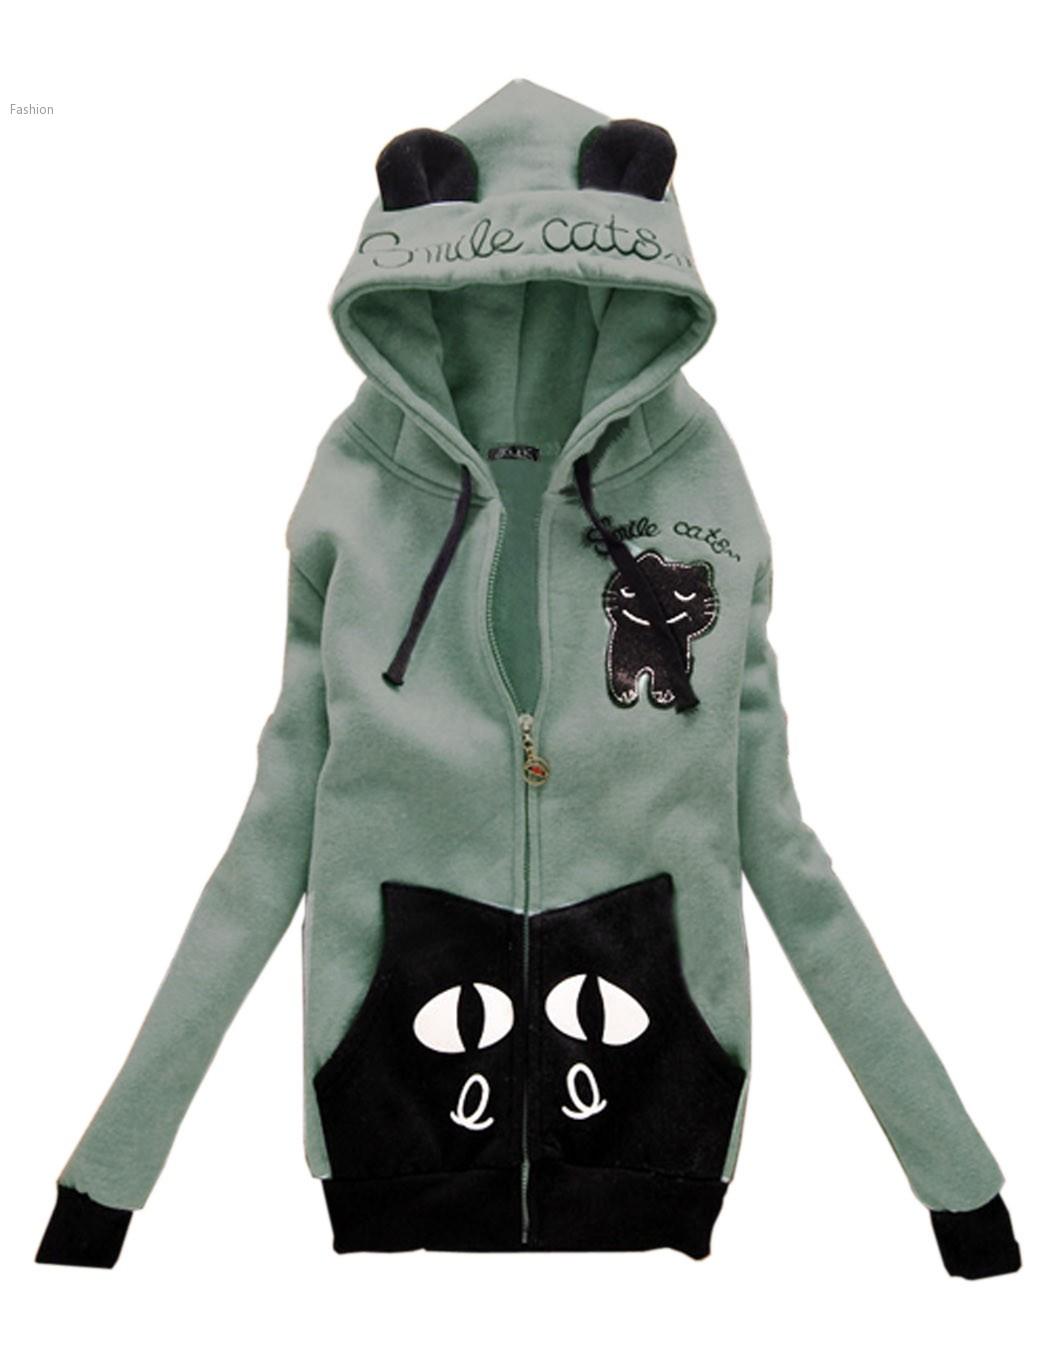 Cute Cat Ears Hooded Sweatshirt